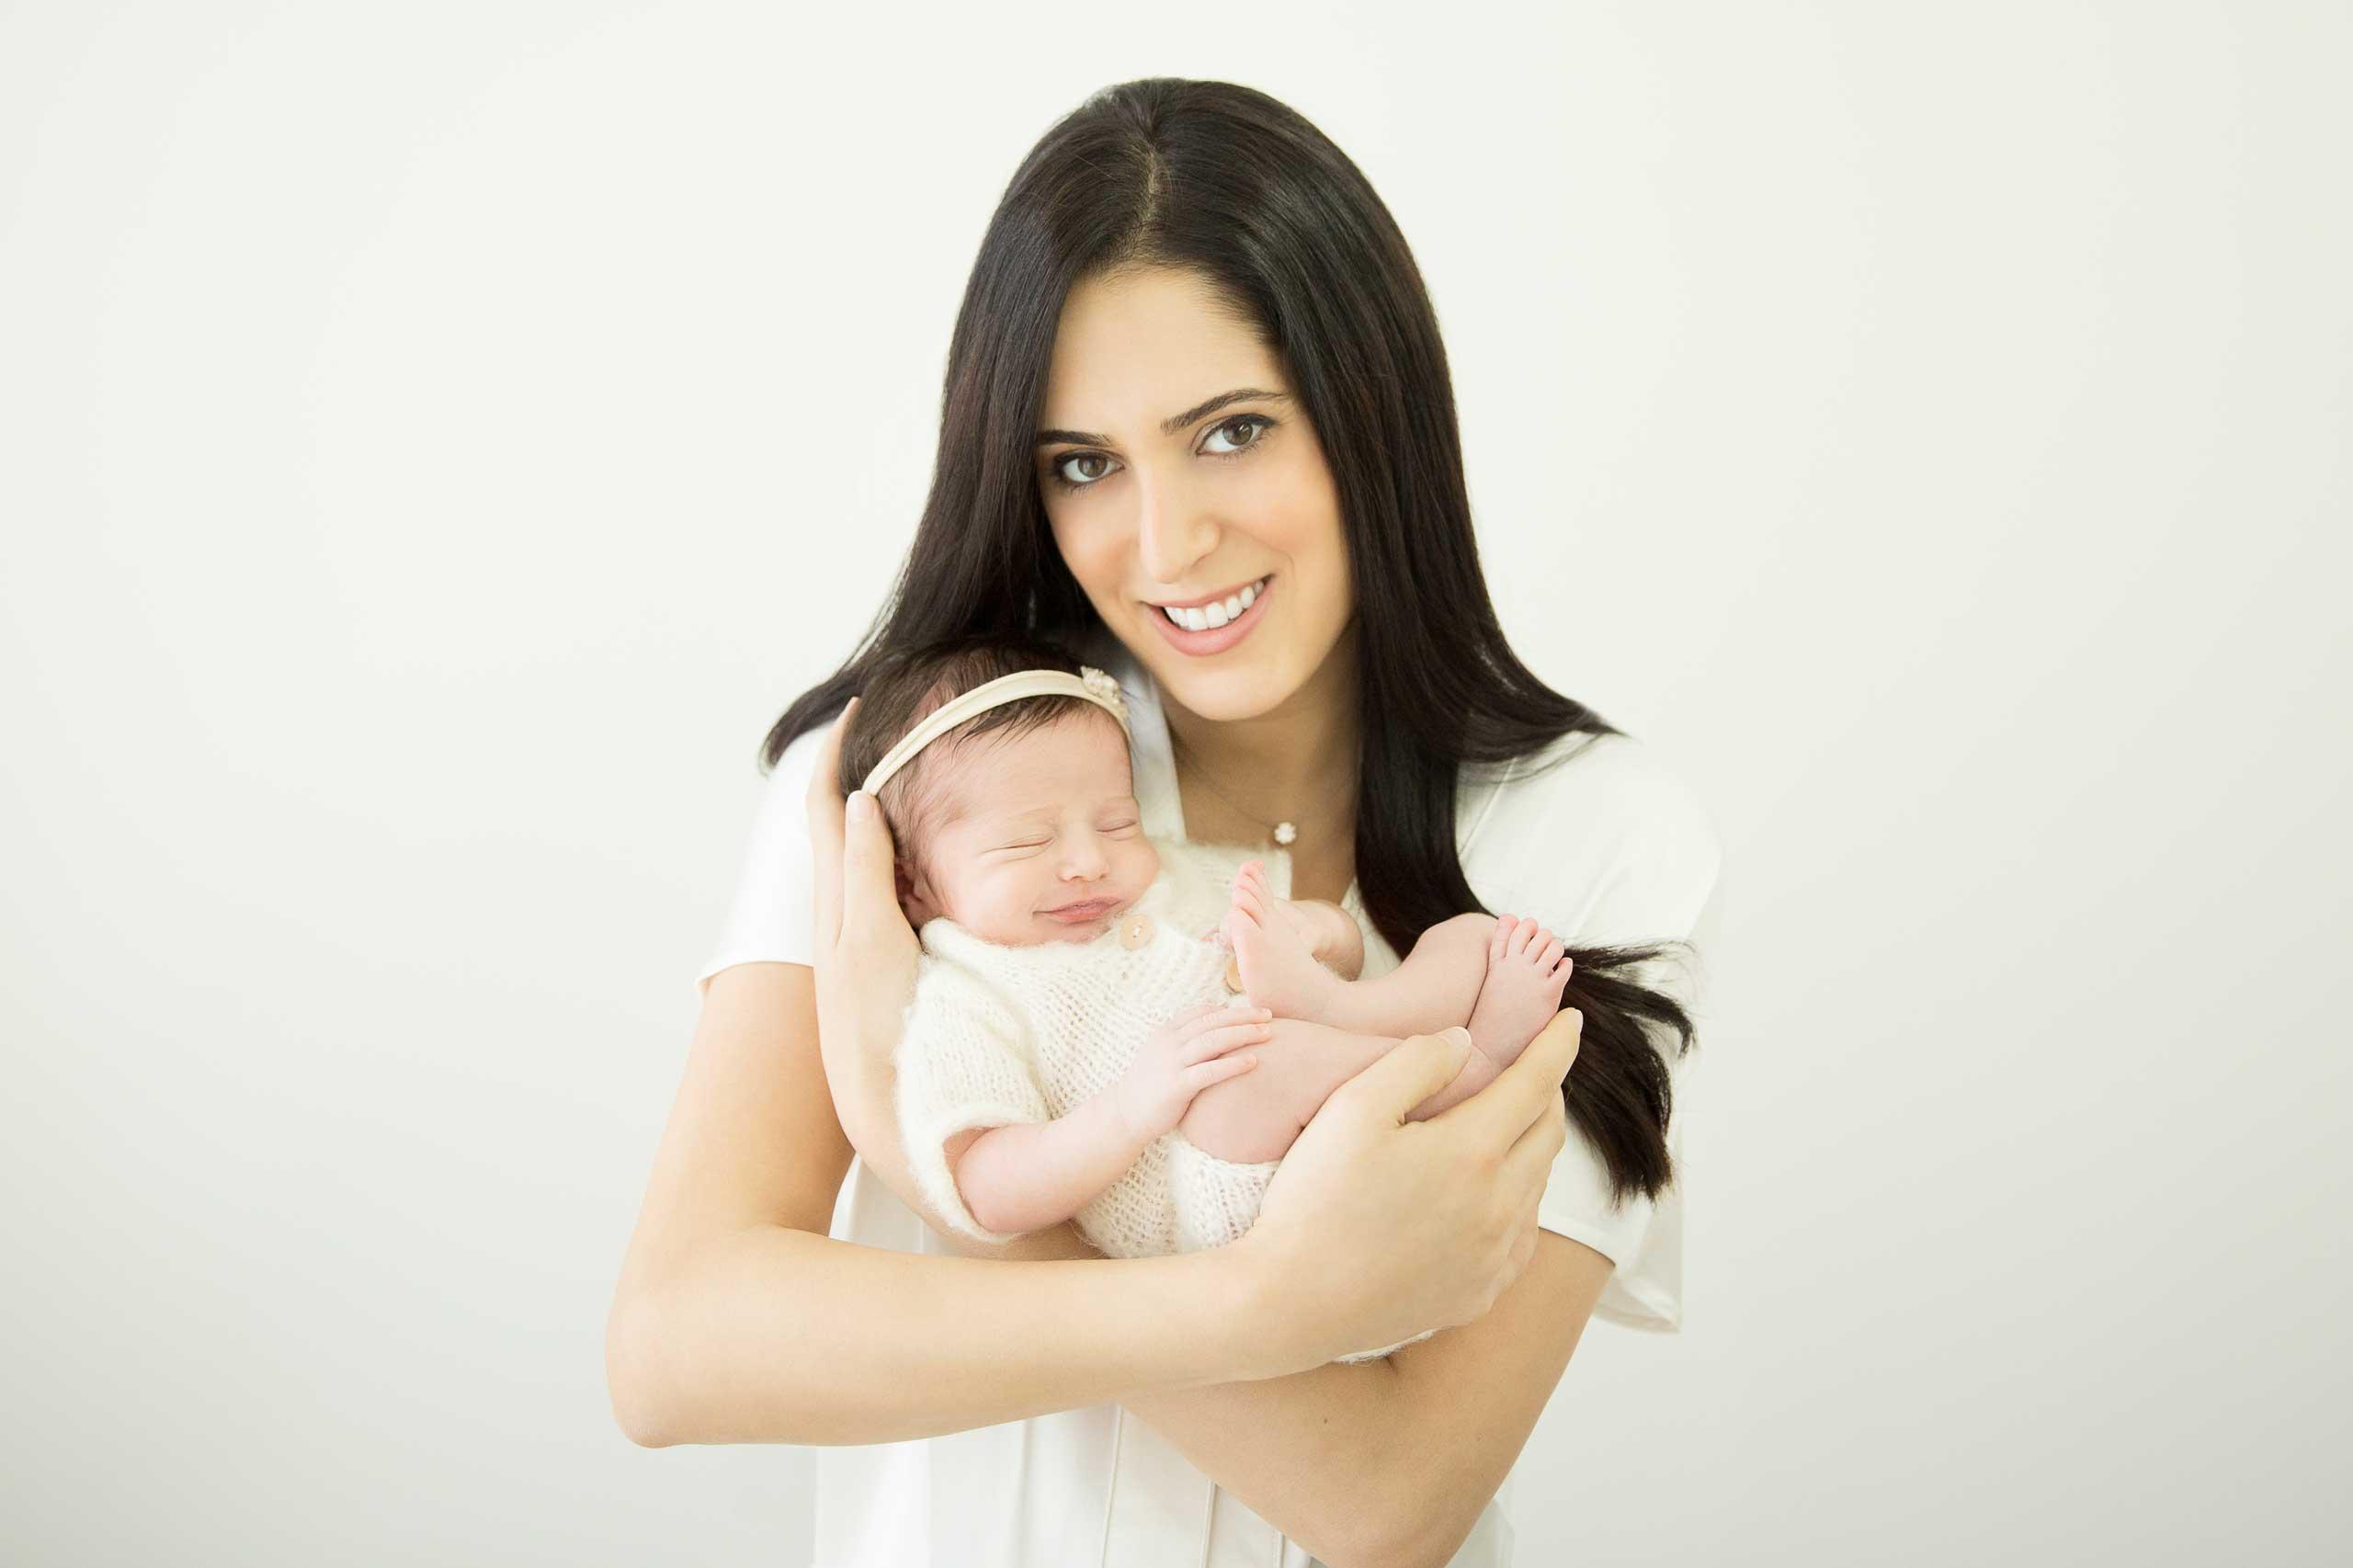 Ramina Magid newborn photography los angeles 33243